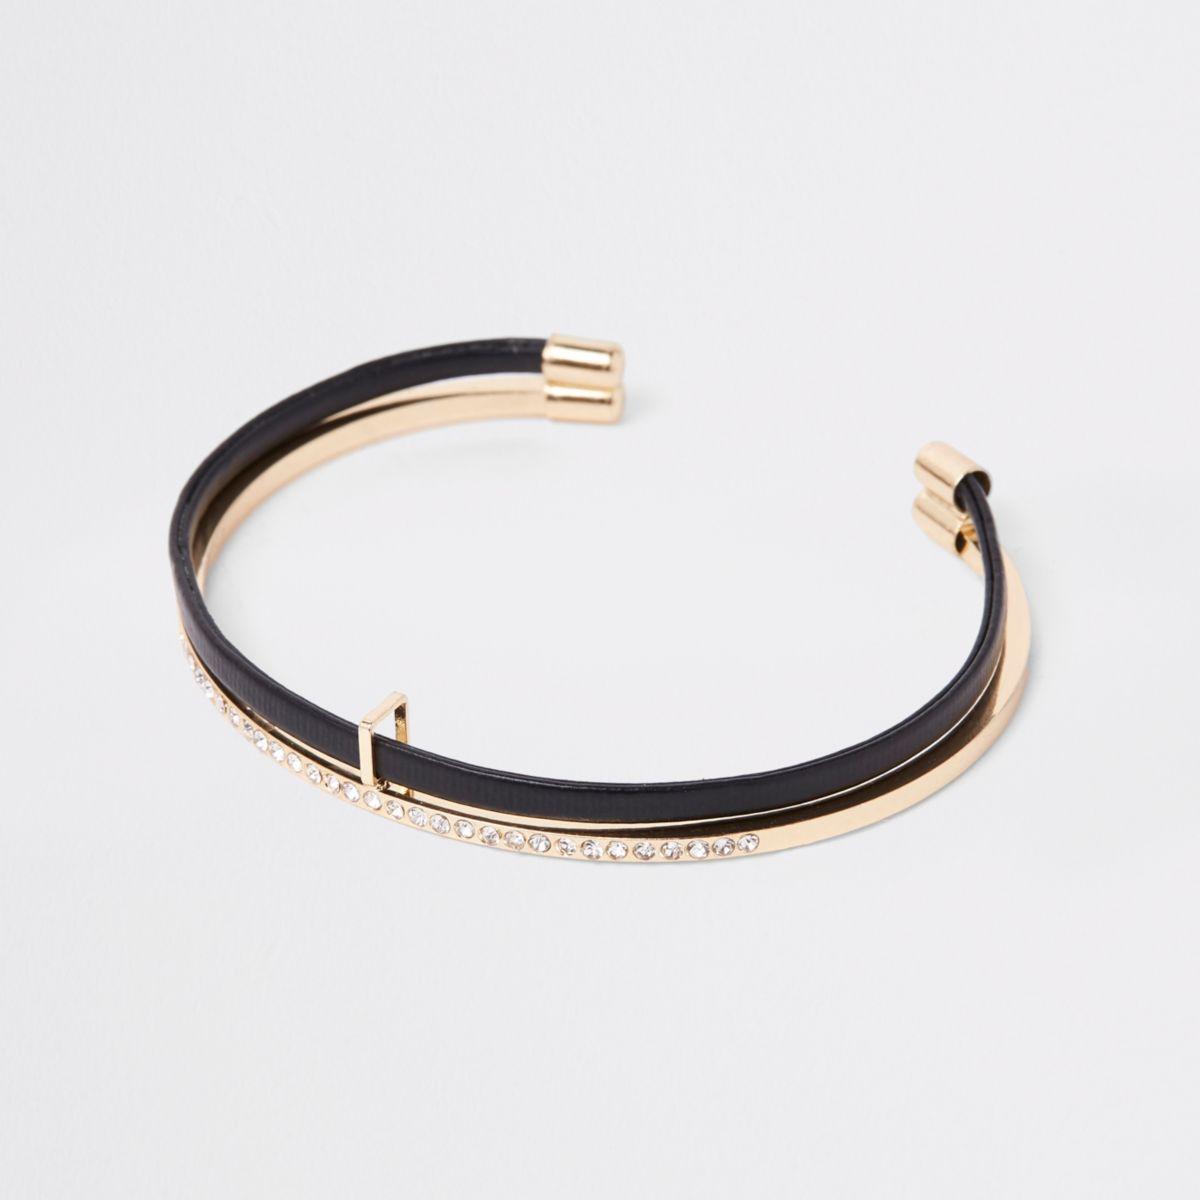 Gold tone double layered cuff bracelet